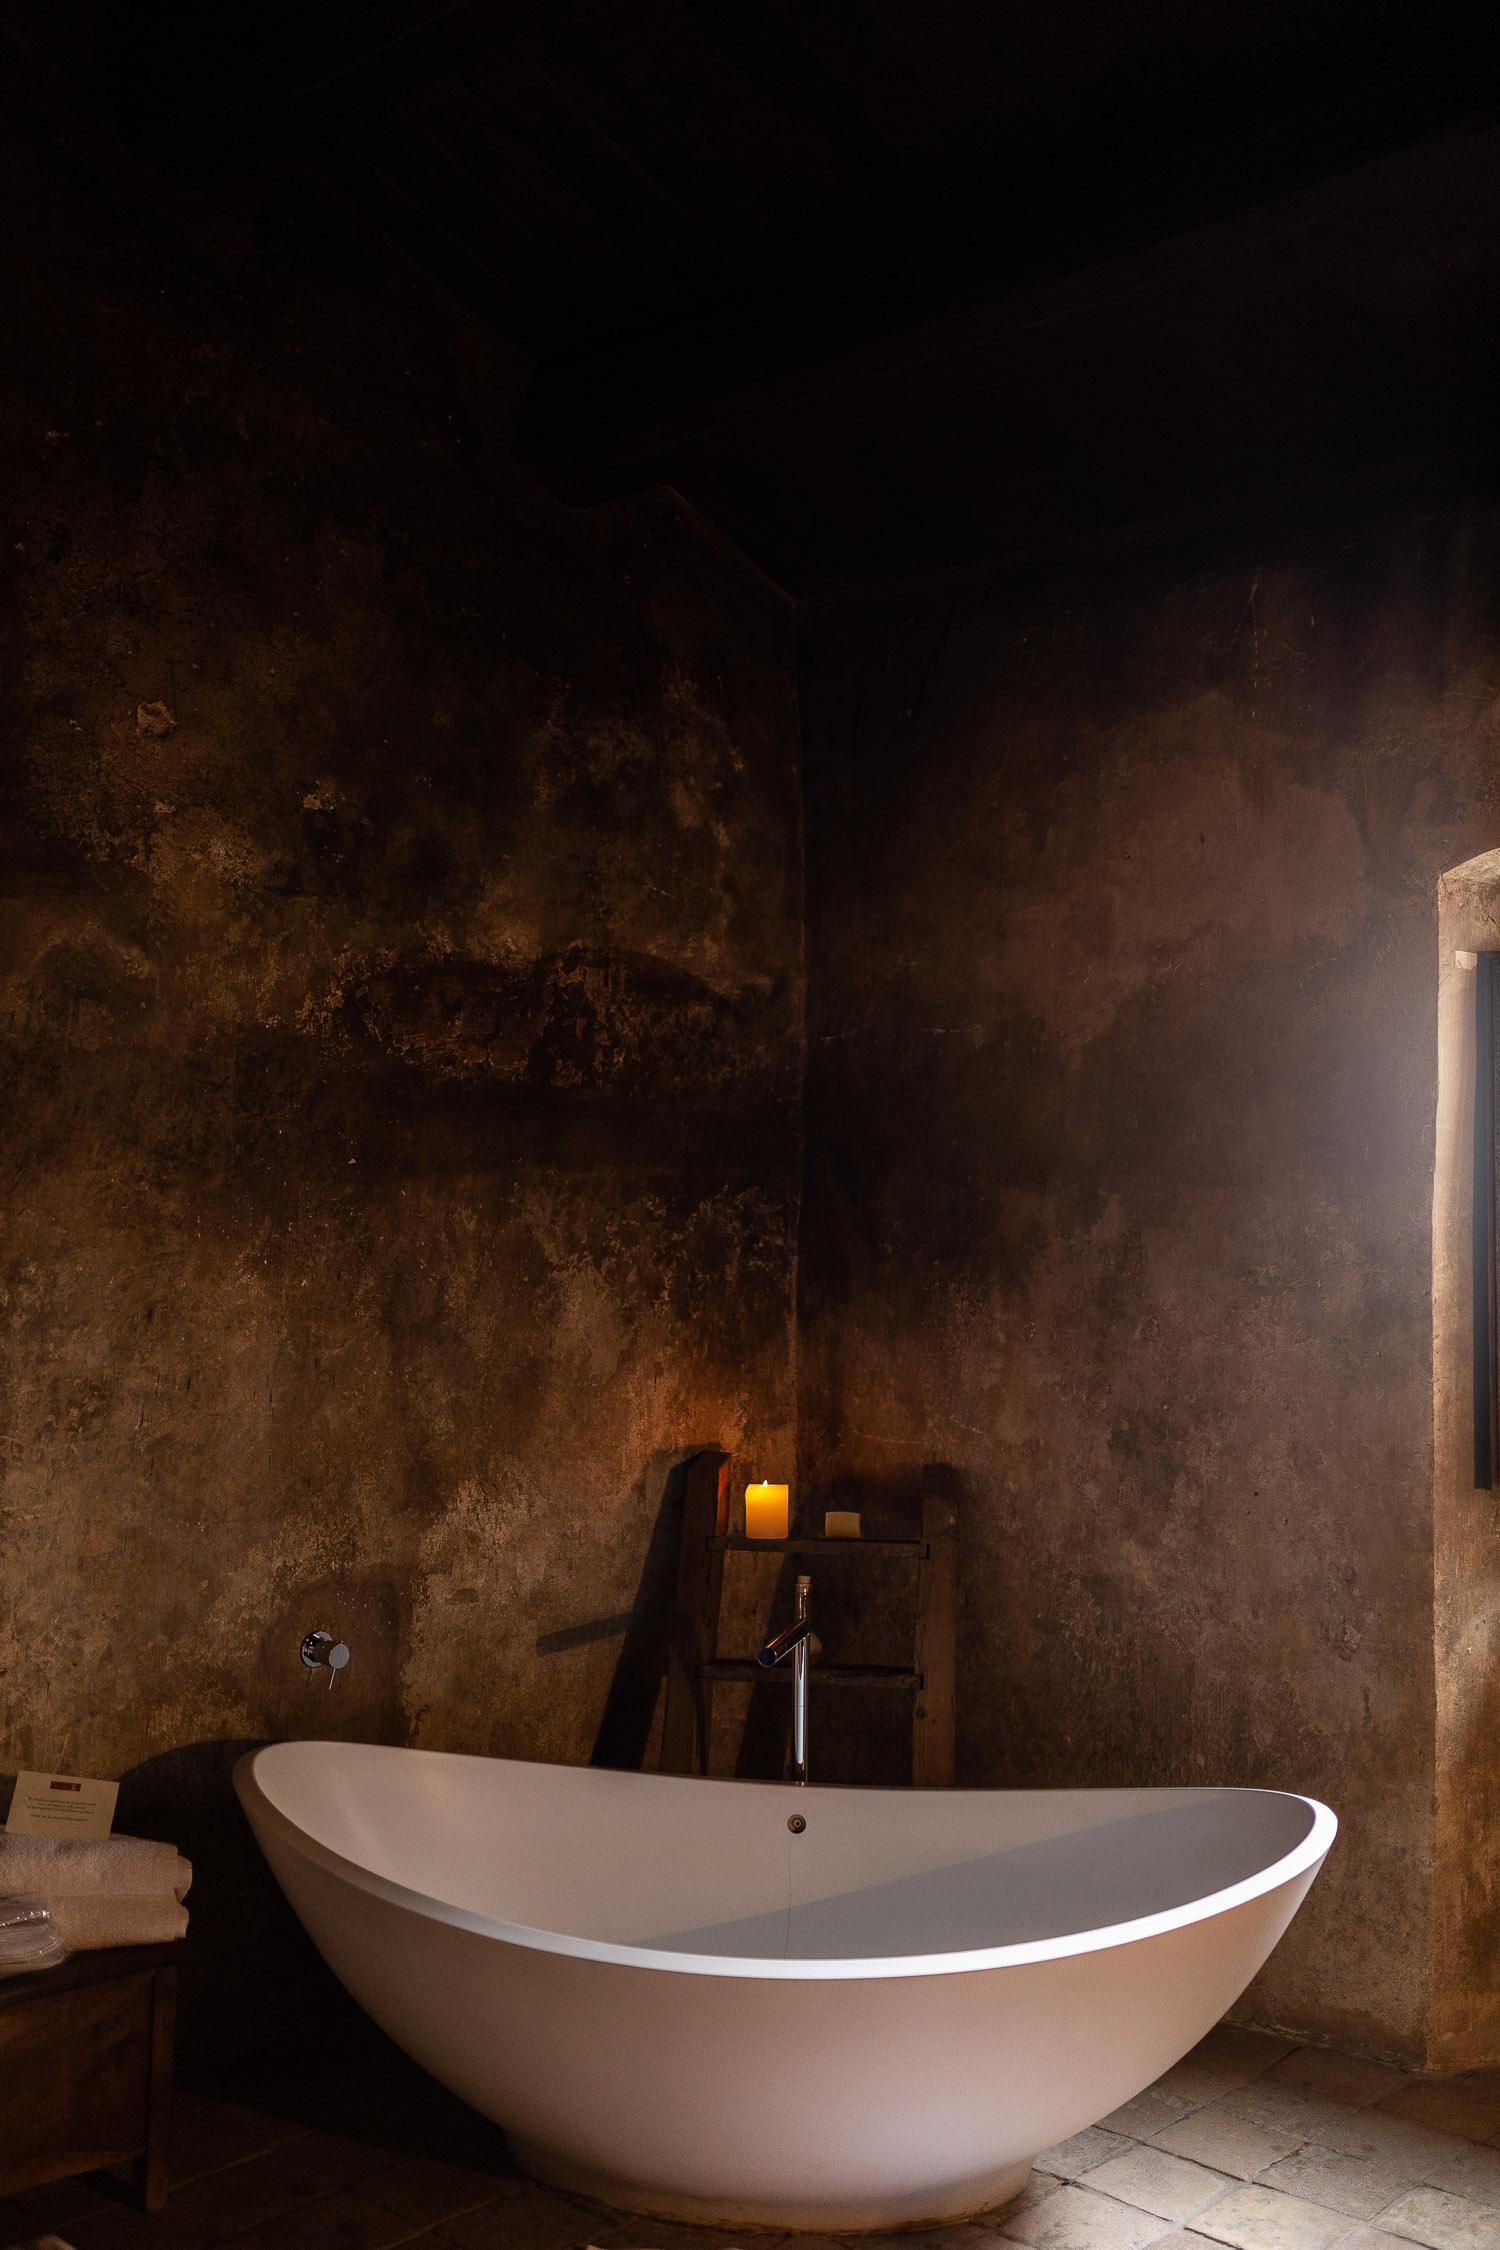 Sextantio-Albergo-Diffuso-Bathtub-Abruzzo-5532.jpg